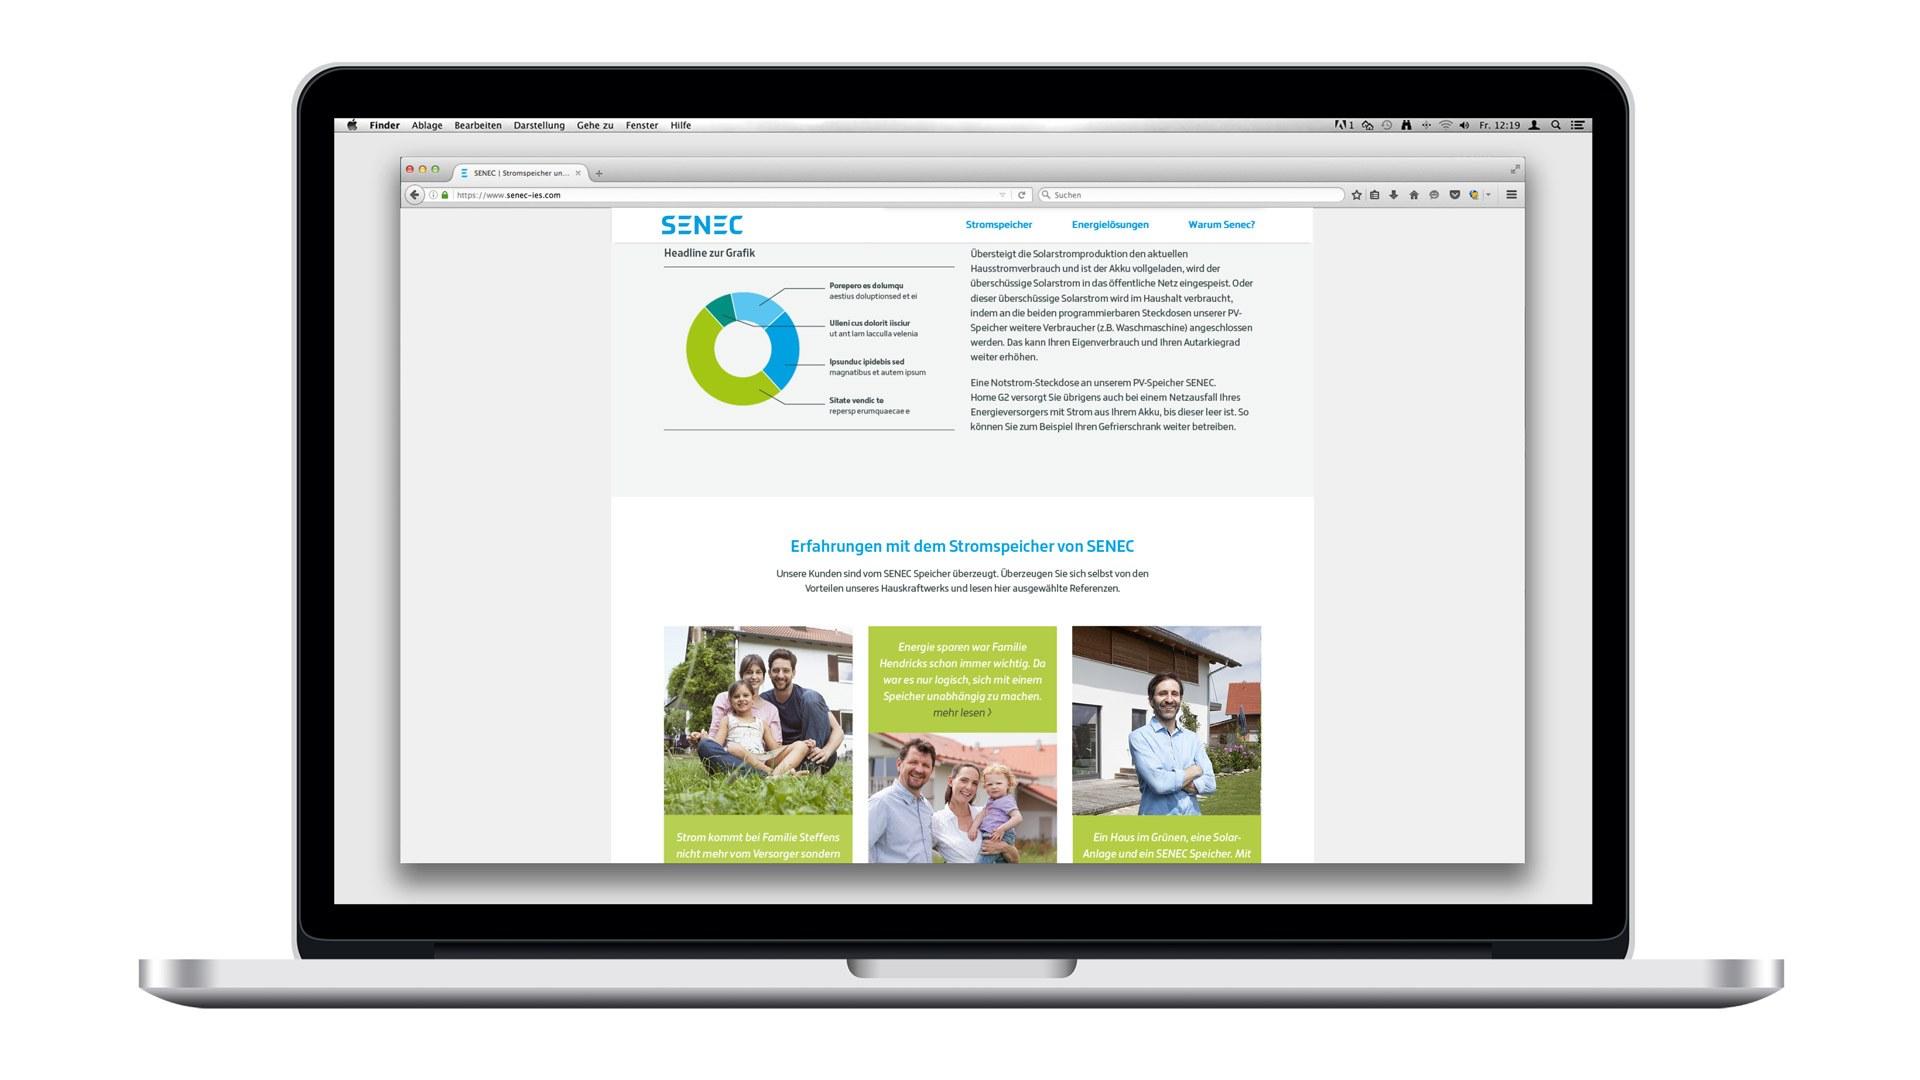 SENEC Digital - Testimonials und Infografiken